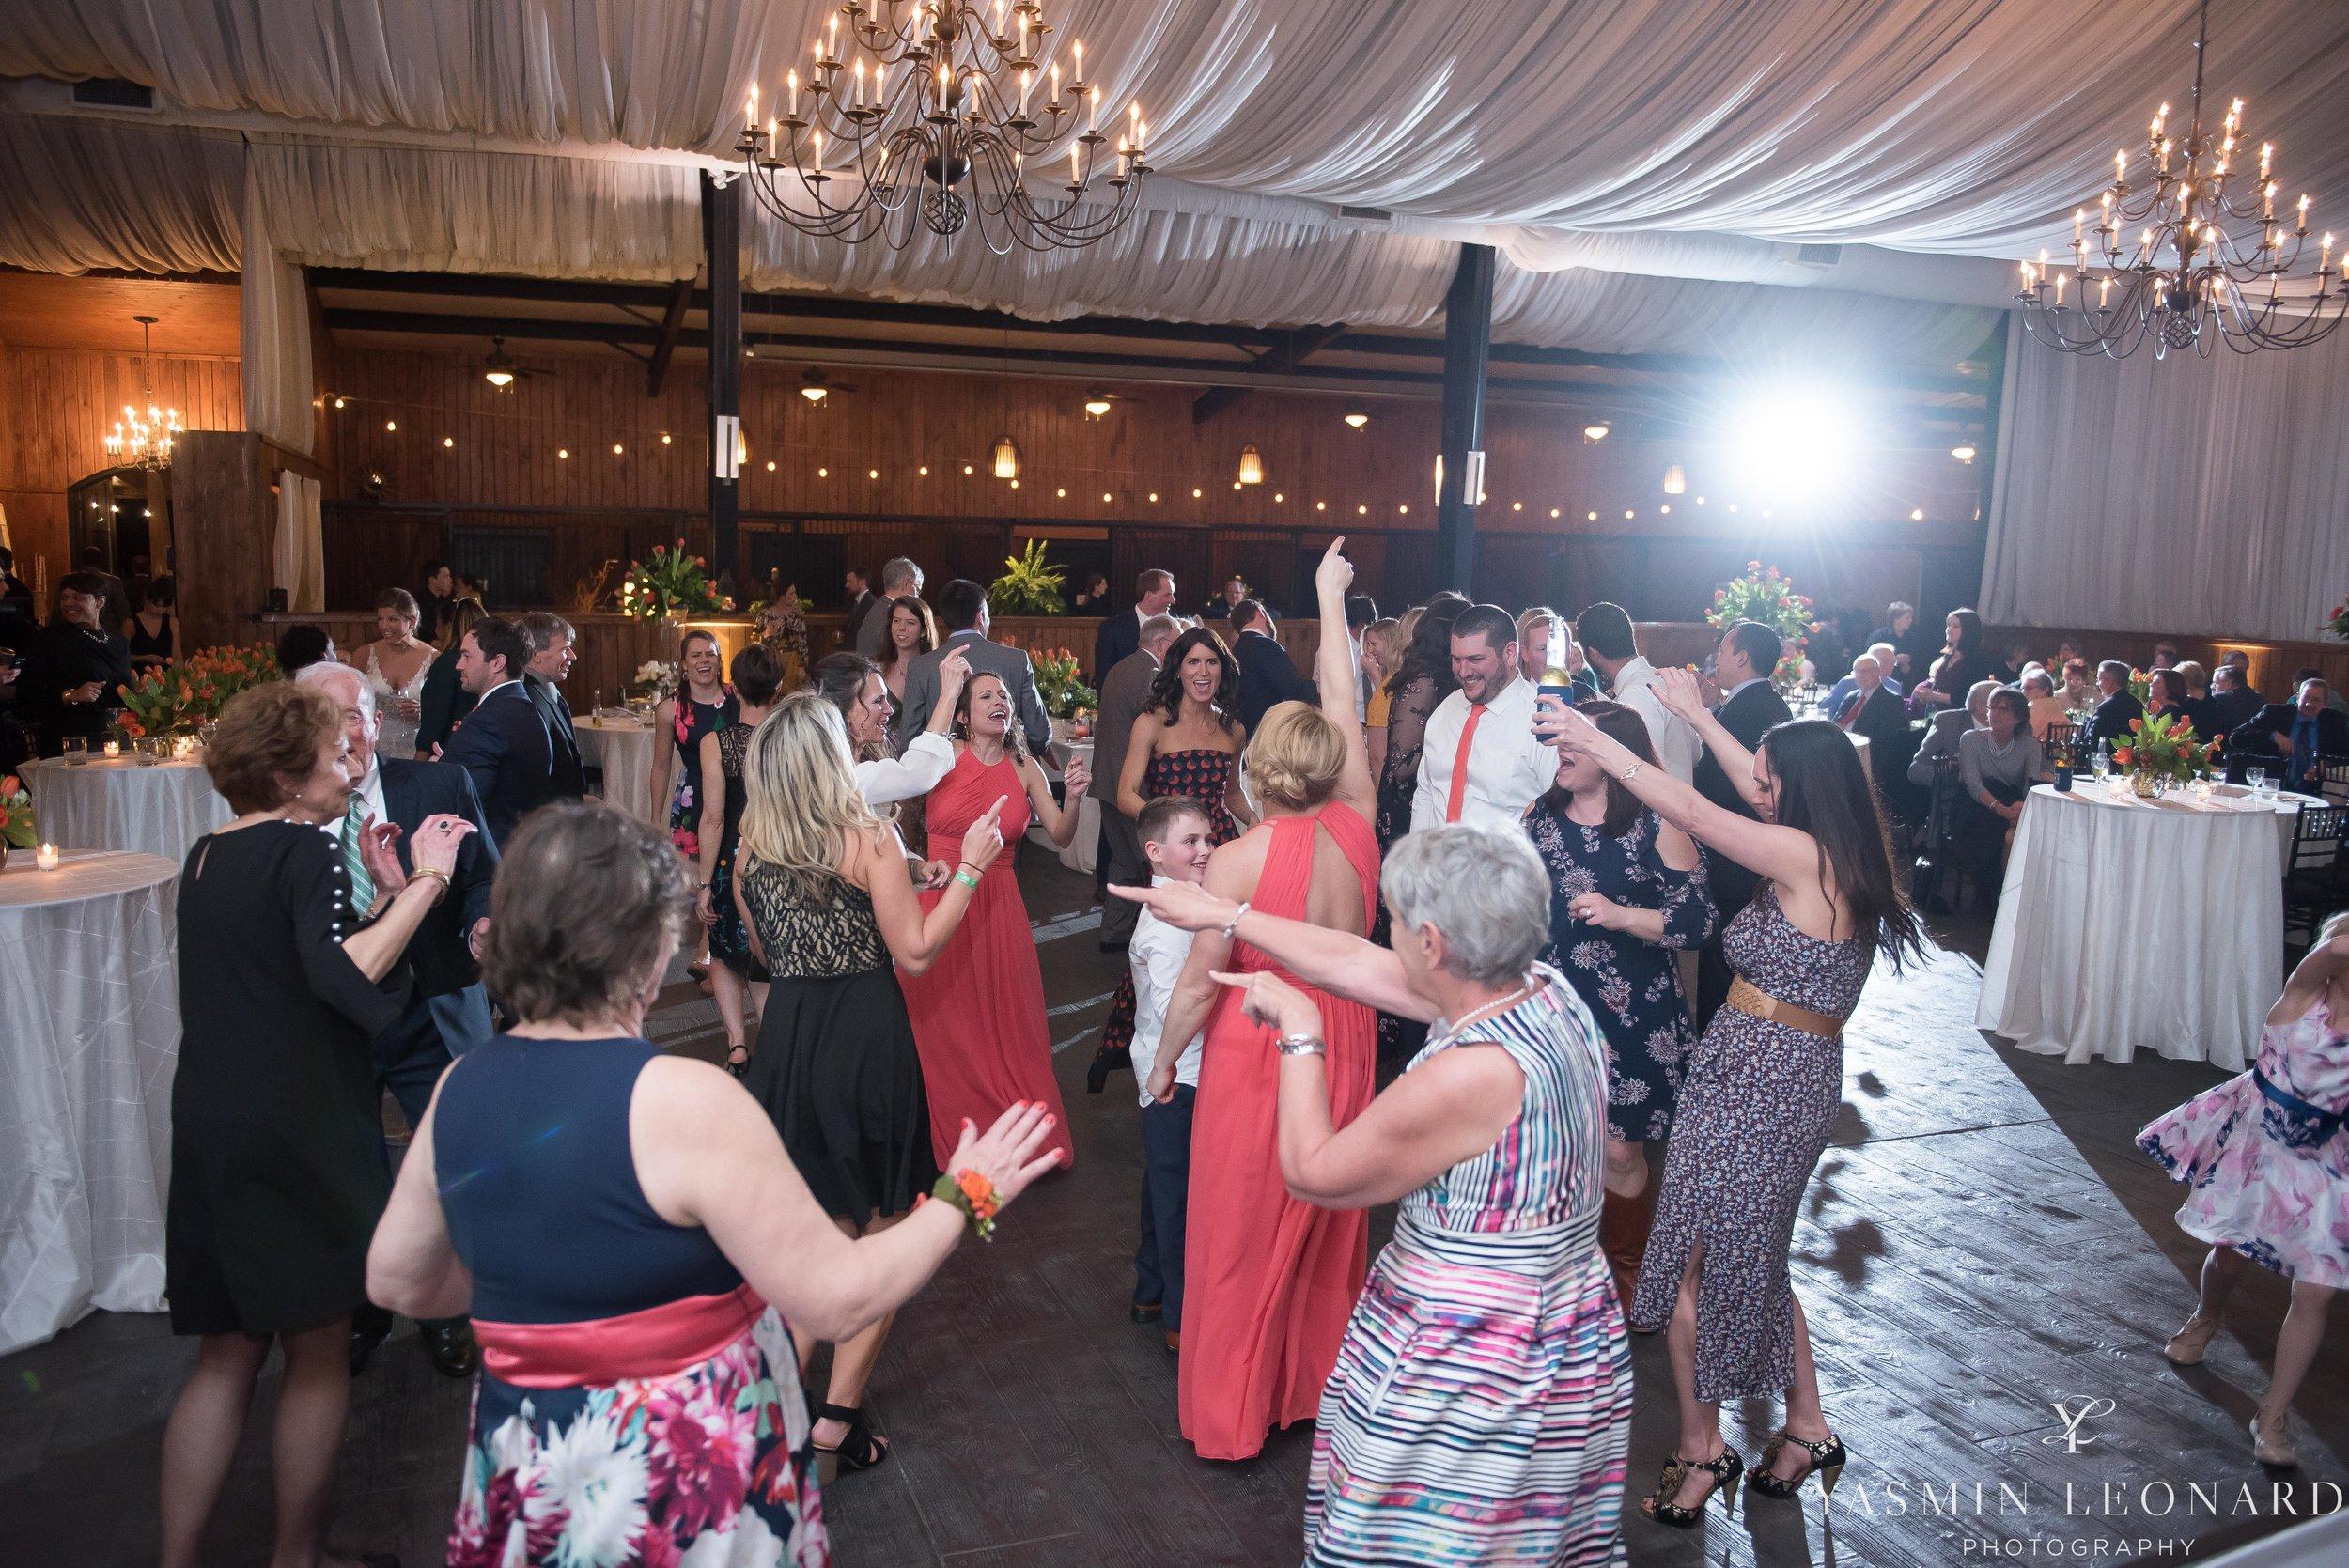 Adaumont Farm - Adaumont Farm Weddings - Trinity Weddings - NC Weddings - Yasmin Leonard Photography-73.jpg